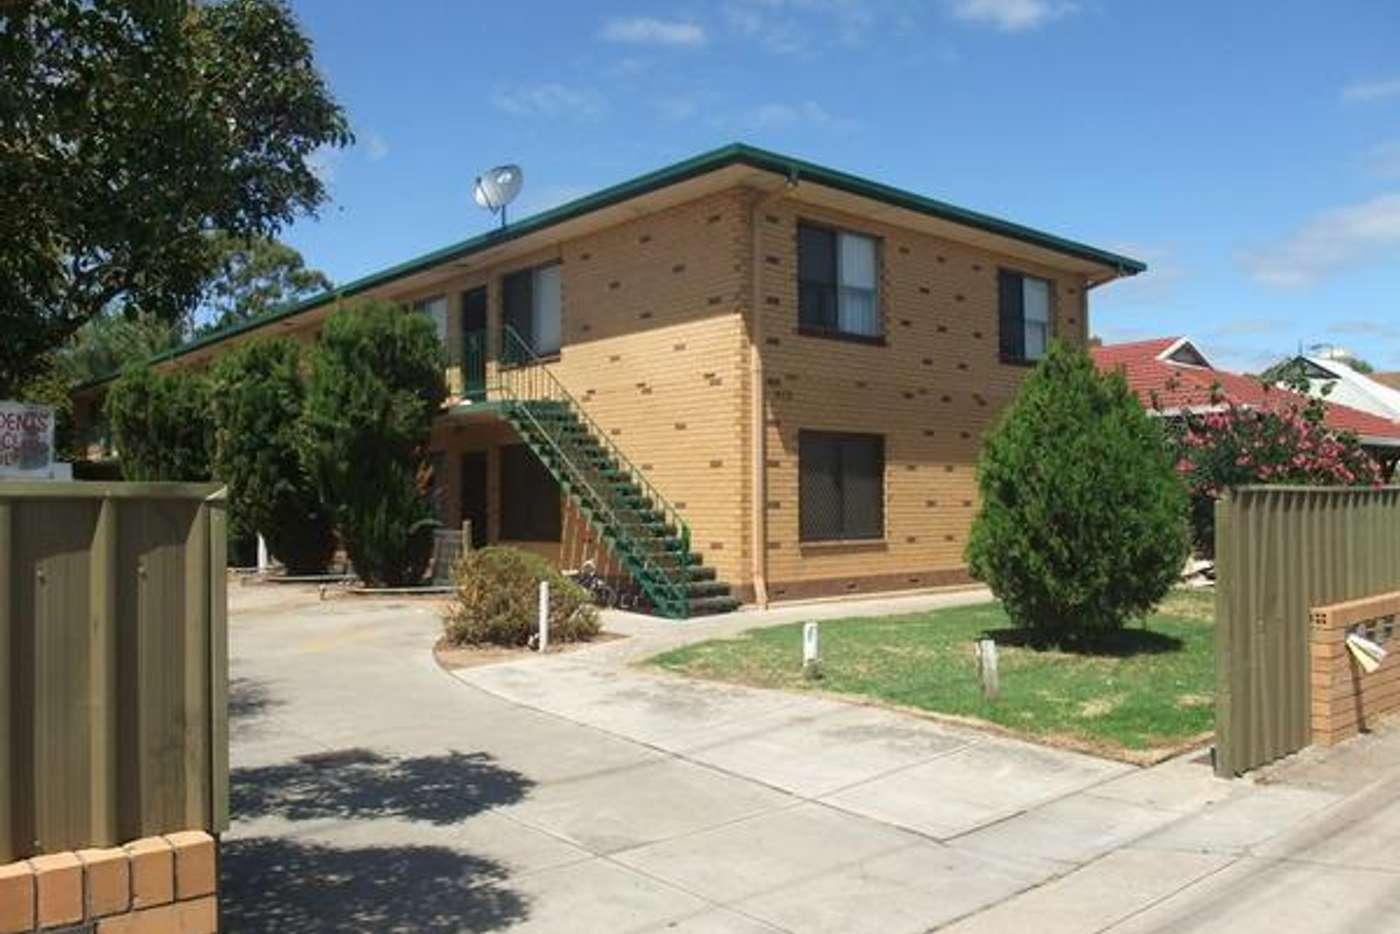 Main view of Homely unit listing, 11/413-415 Churchill Road, Kilburn SA 5084